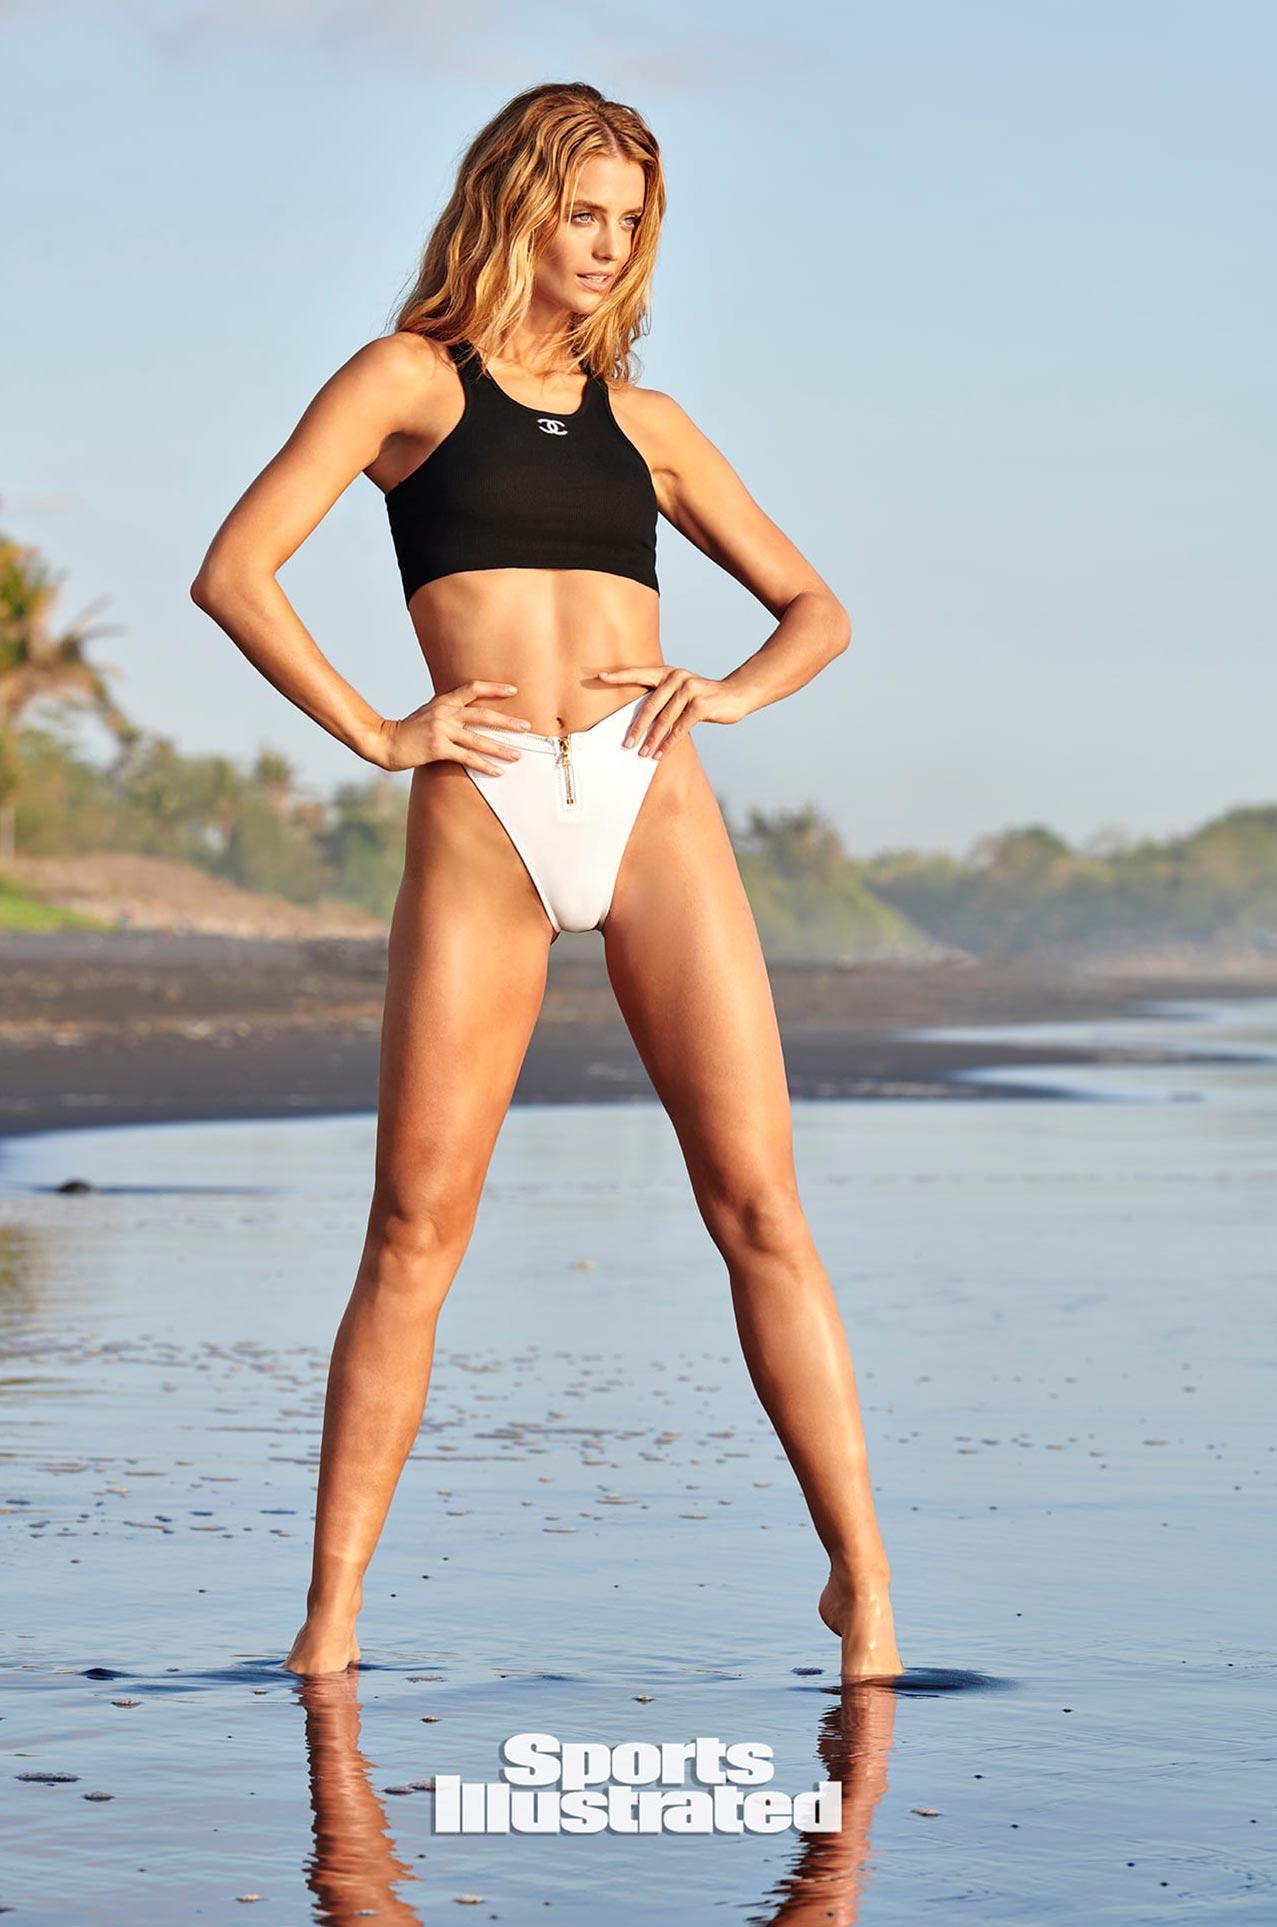 Кейт Бок в каталоге купальников Sports Illustrated Swimsuit 2020 / фото 08